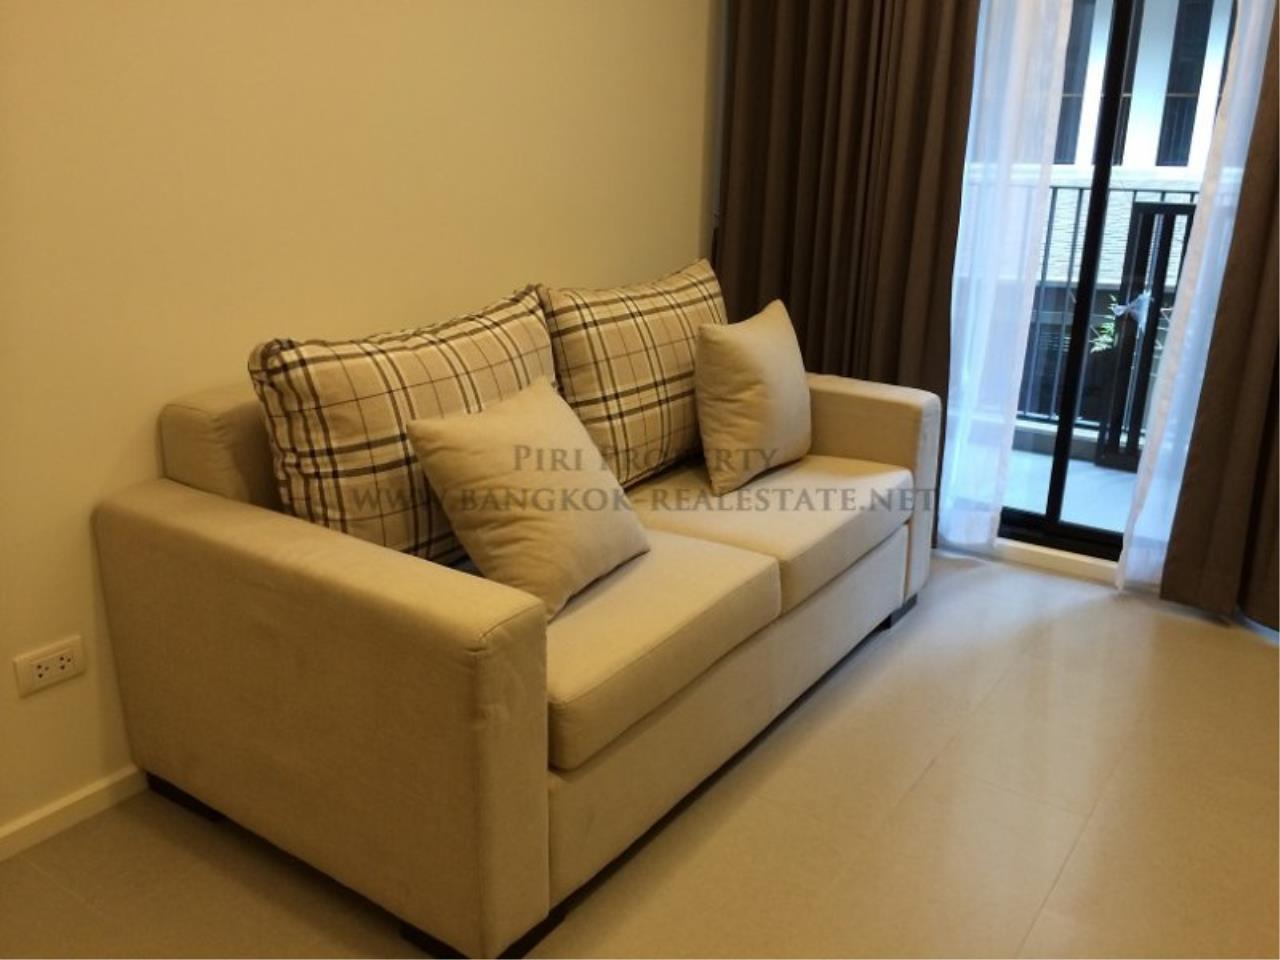 Piri Property Agency's The Nest Ploenchit for Rent - Cozy 1 Bedroom Condo for Rent 1